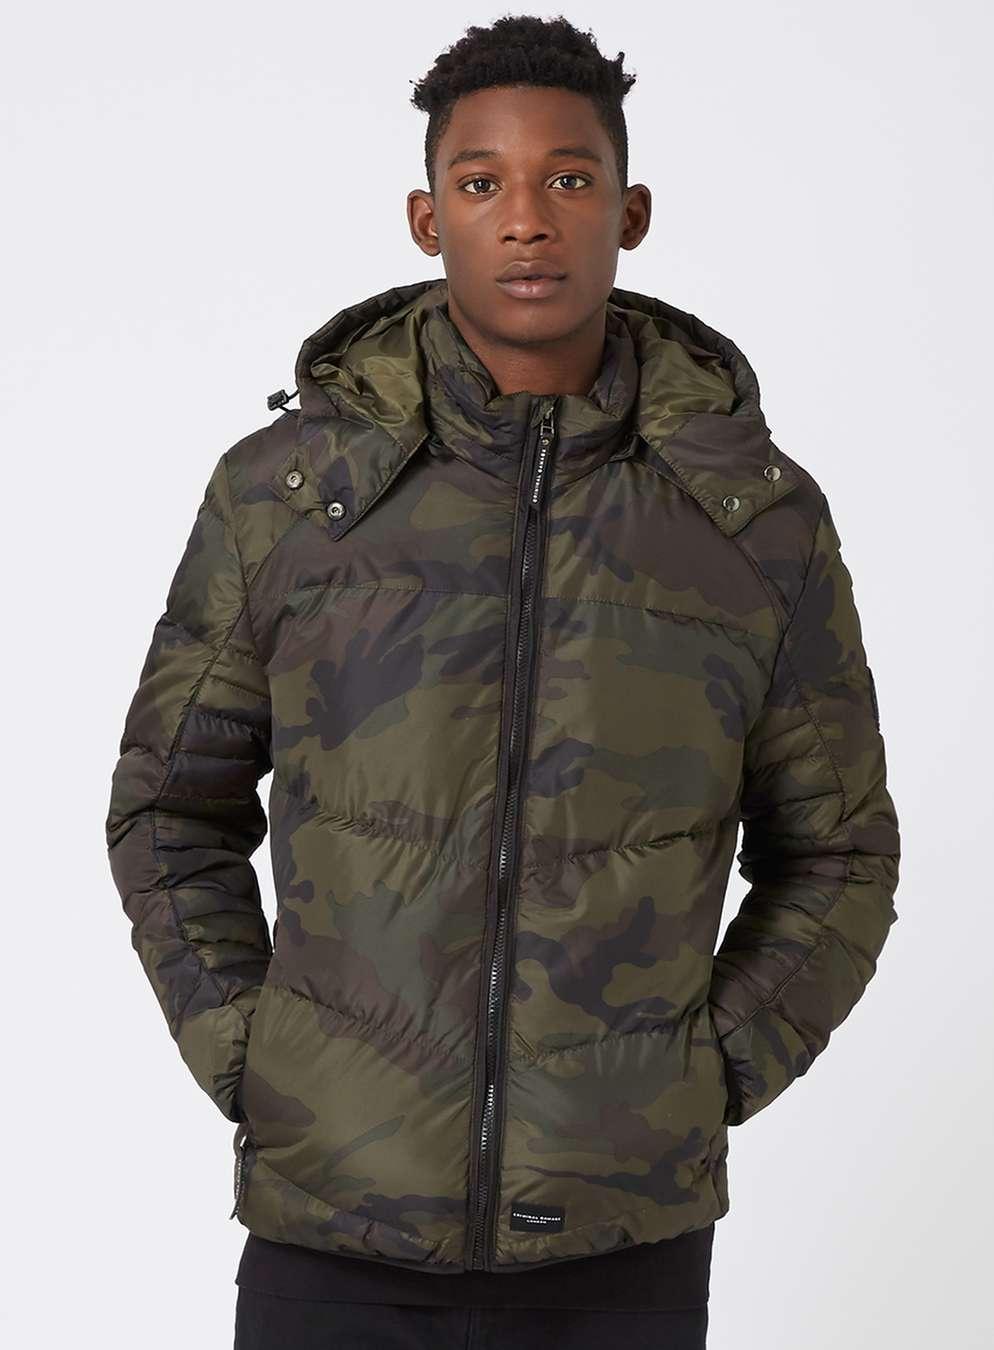 Topman - Criminal Damage Camo Puffer Jacket